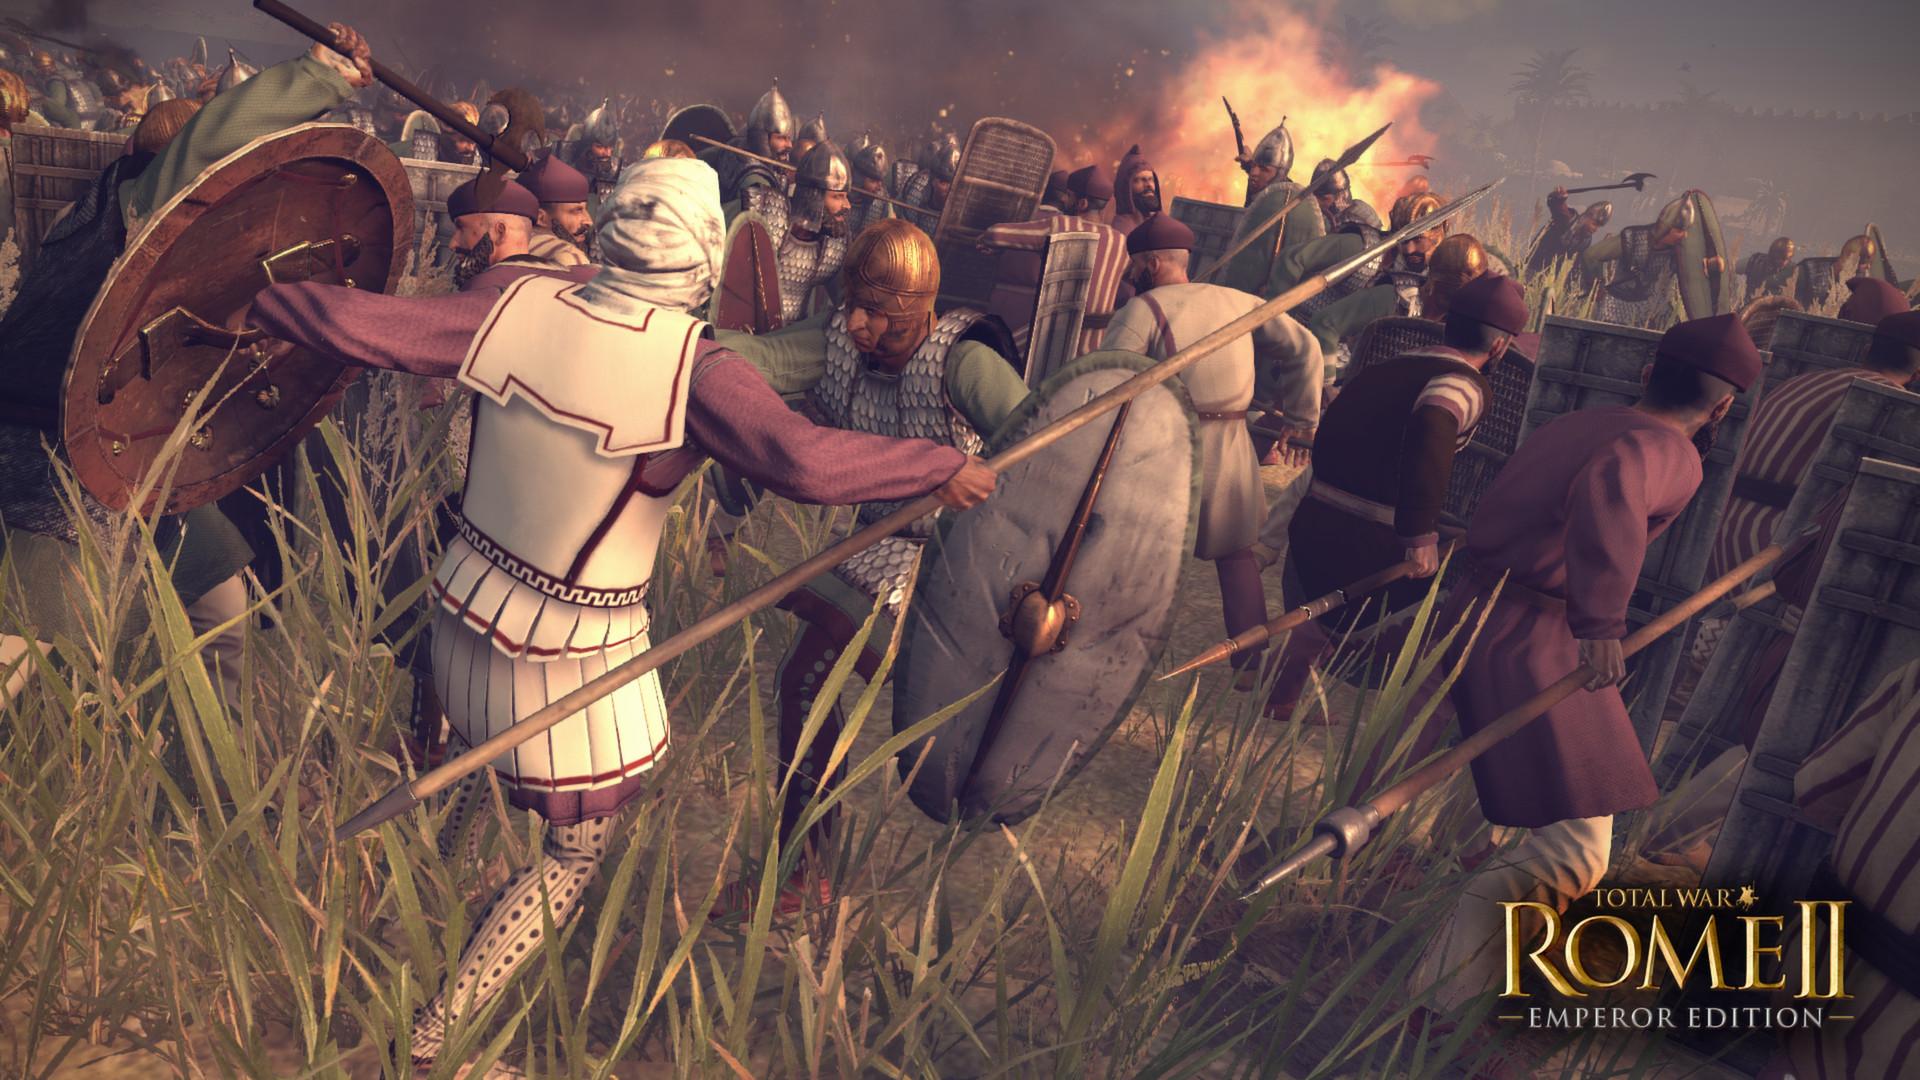 Total war shogun 2 gold edition torrent kickass search awaycrise.